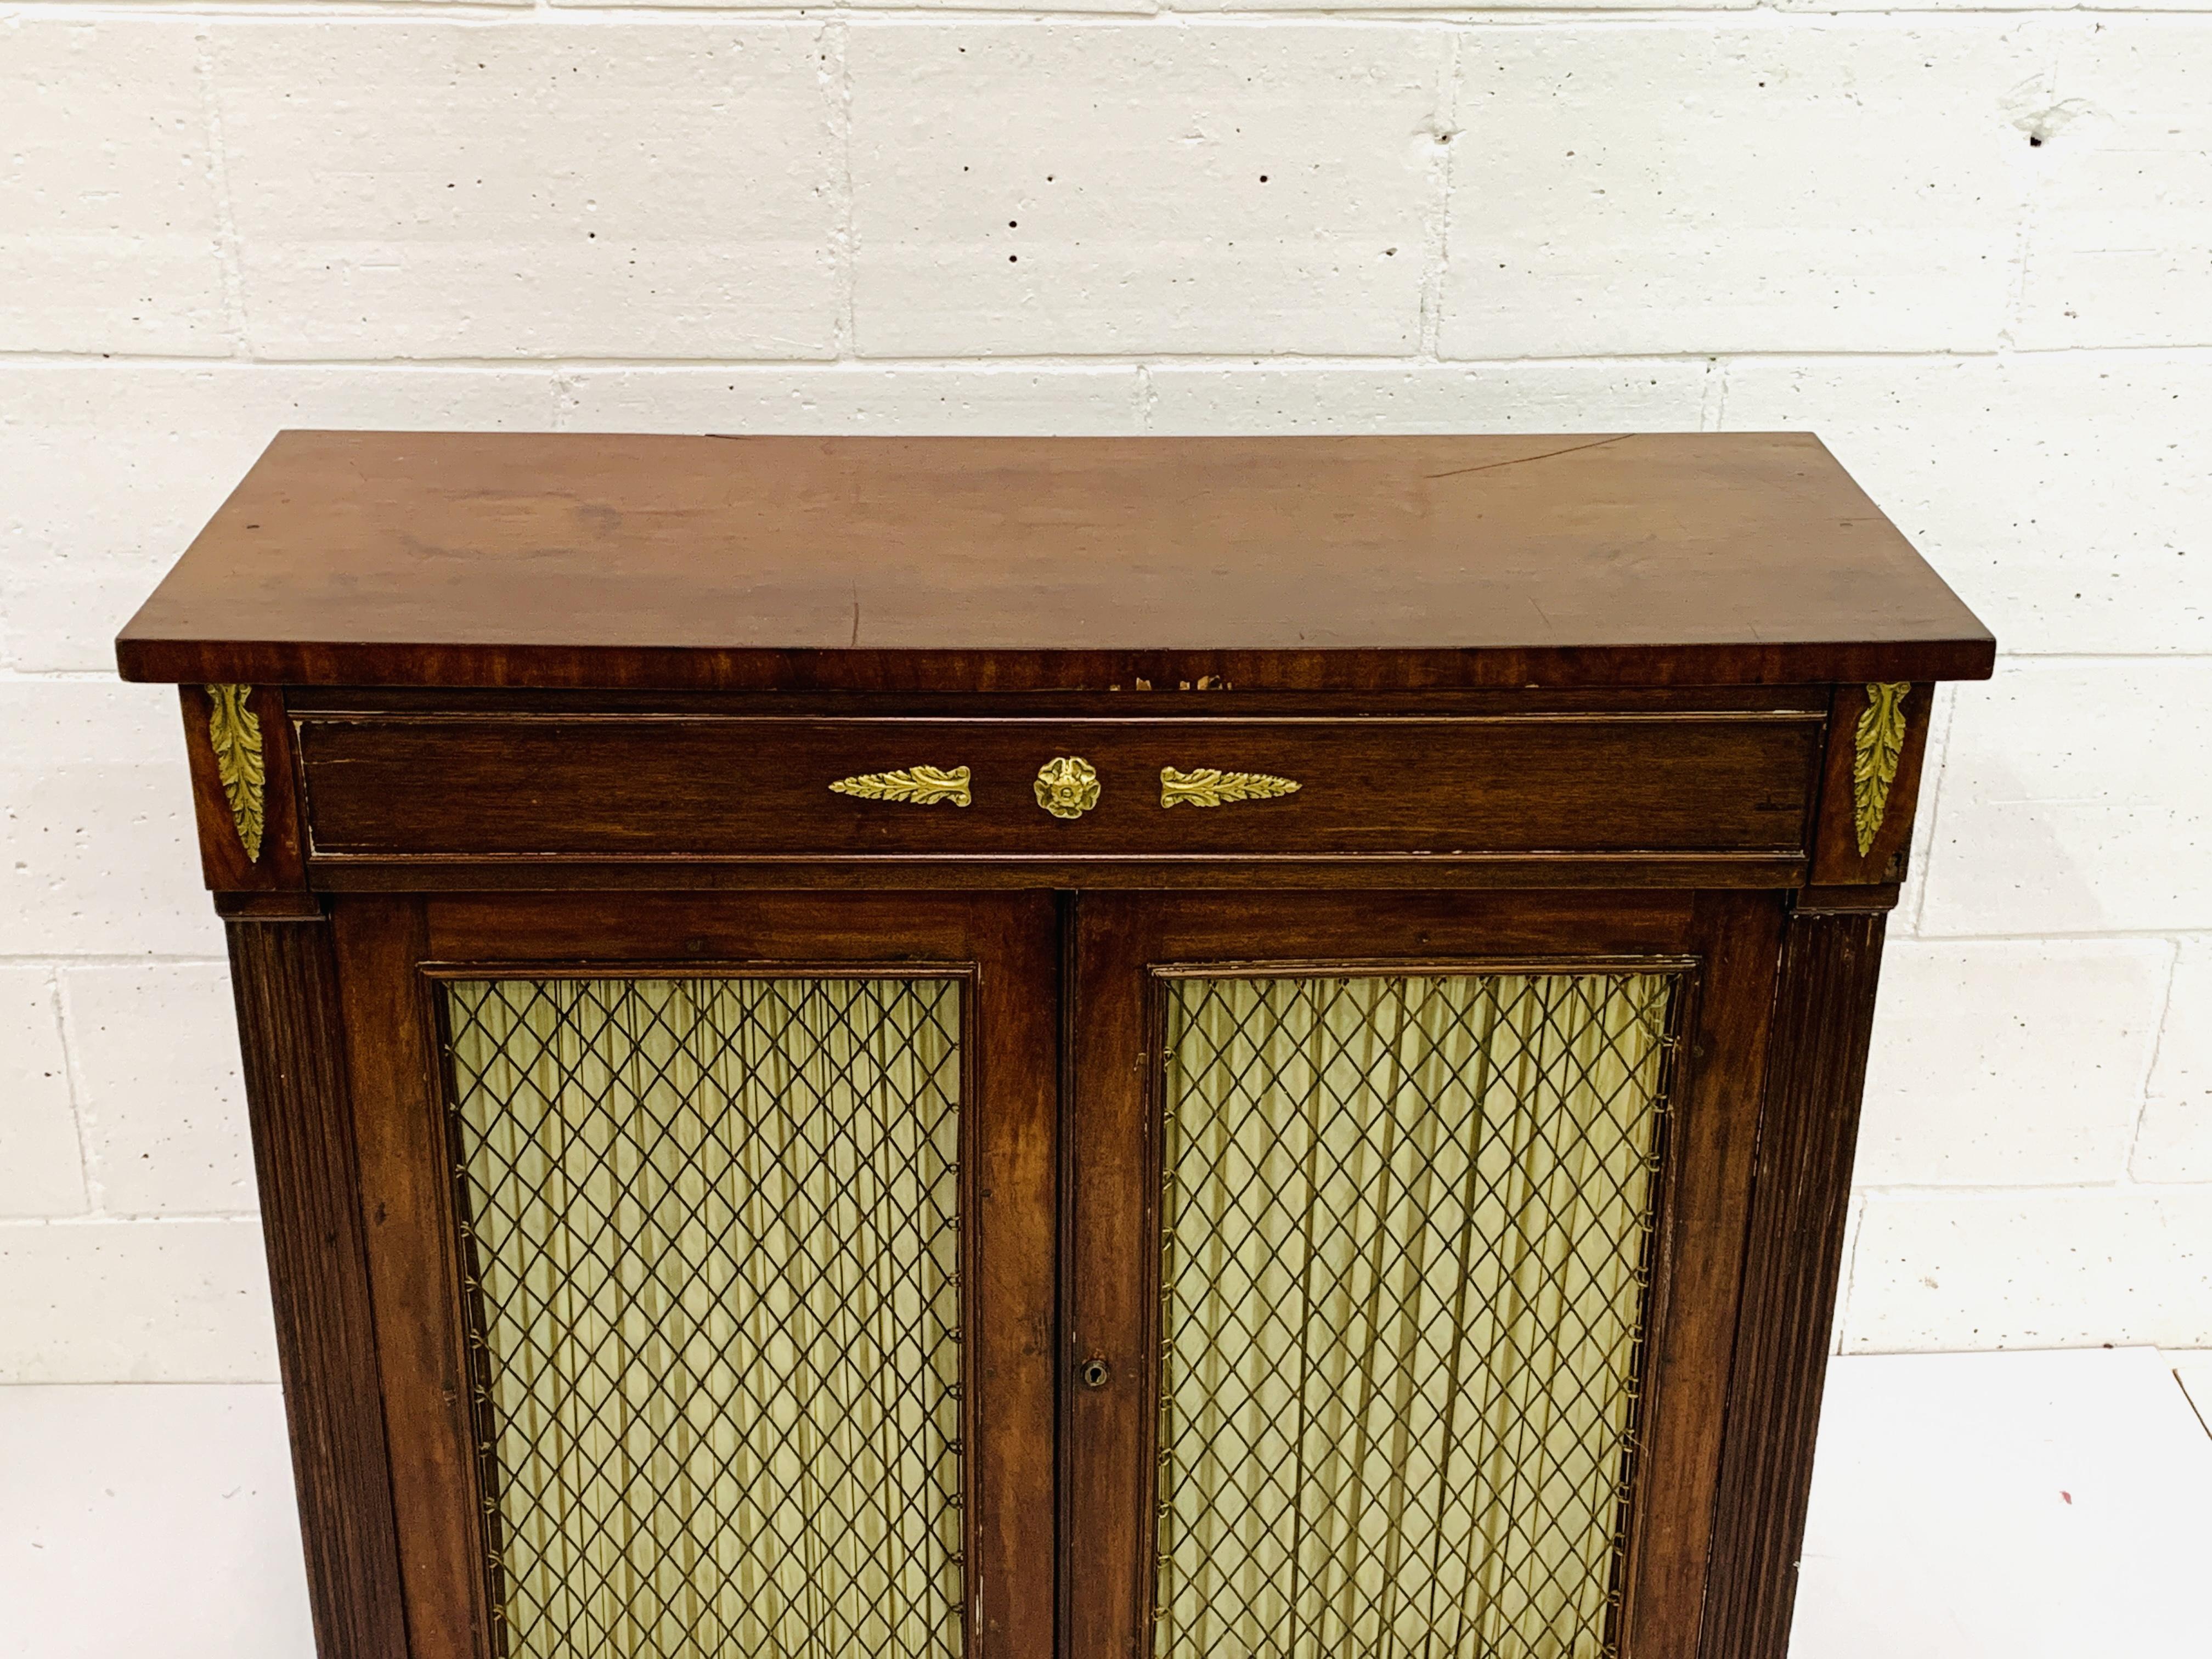 19th Century brass mounted mahogany chiffonier - Image 2 of 4